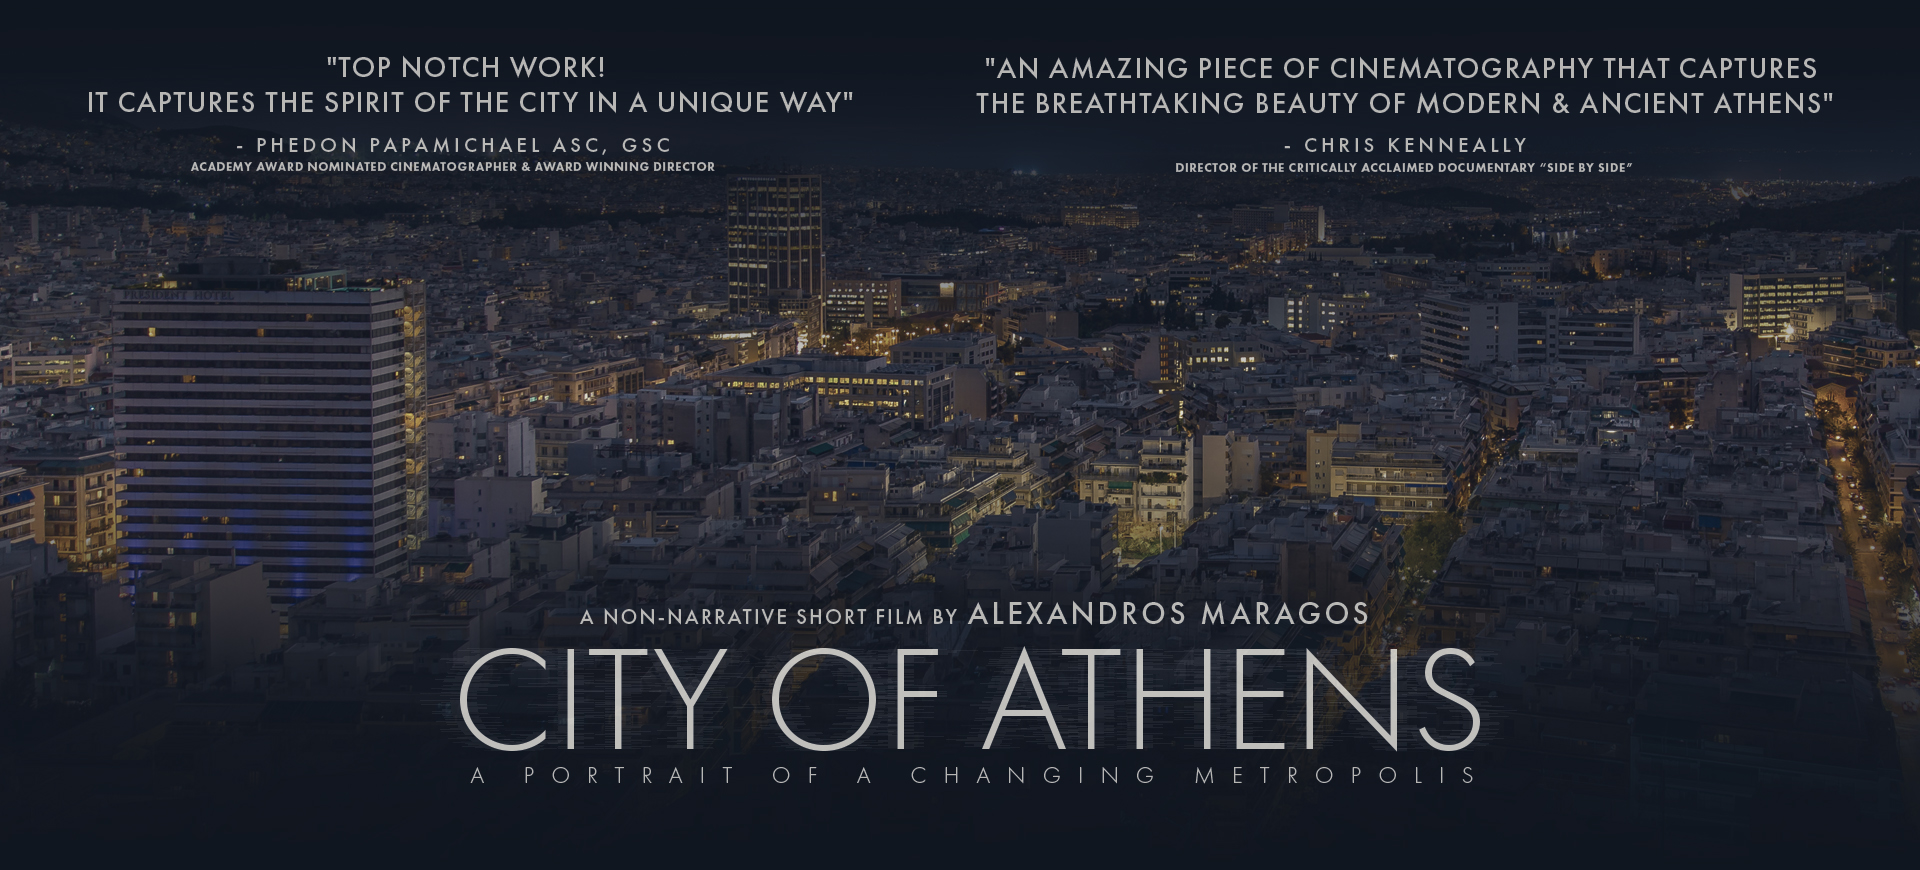 City of Athens - A Short Film by Alexandros Maragos